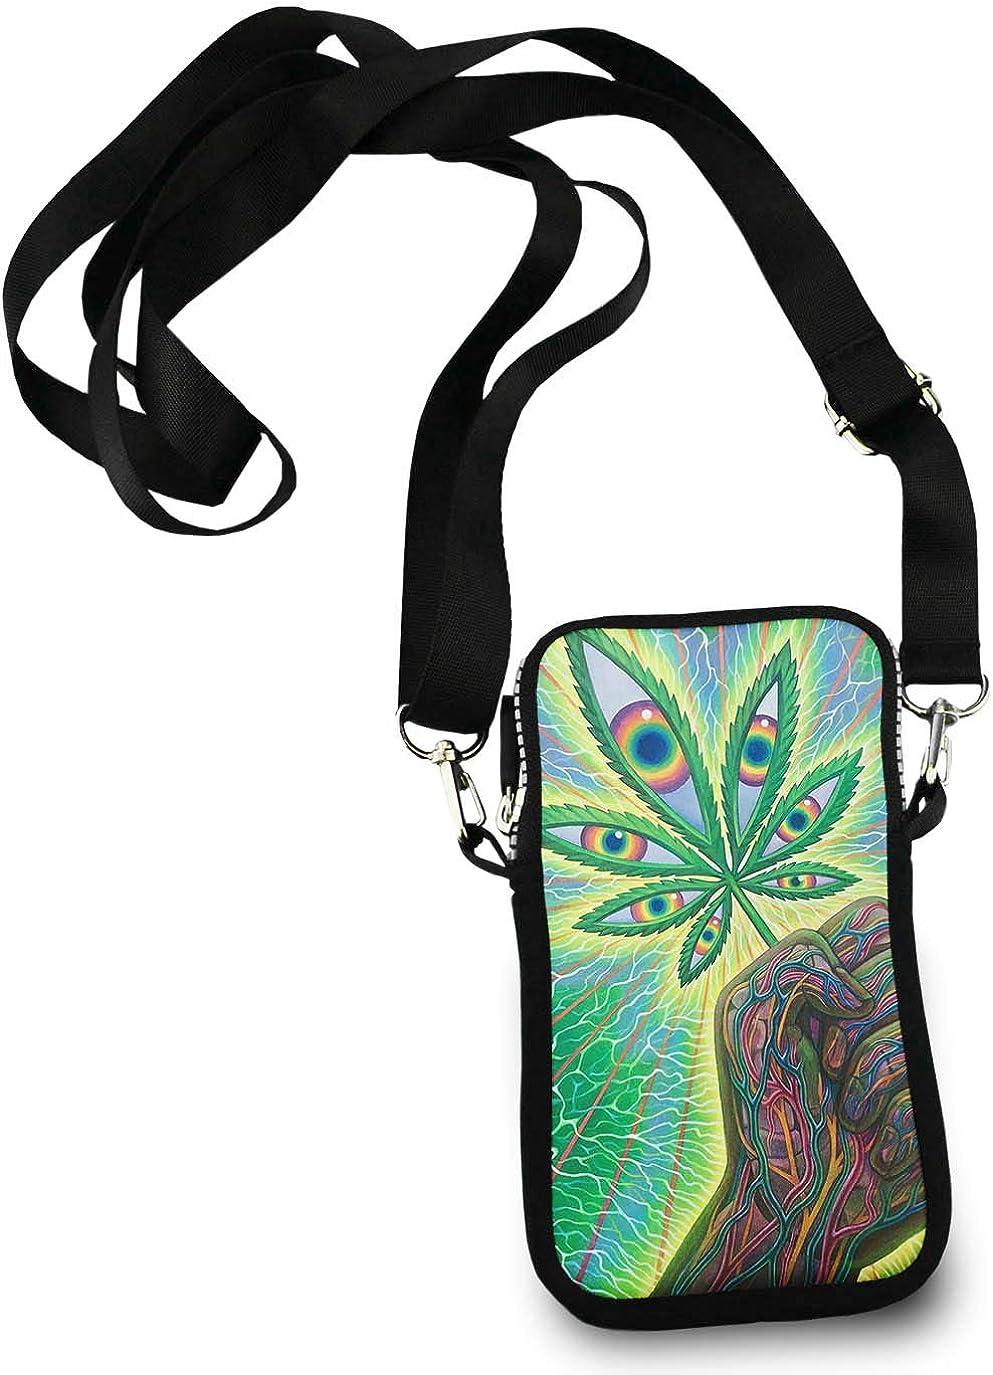 Unisex Small Crossbody Bag Cell Phone Purse Wallet Headphone Bag eyes marijuana weed